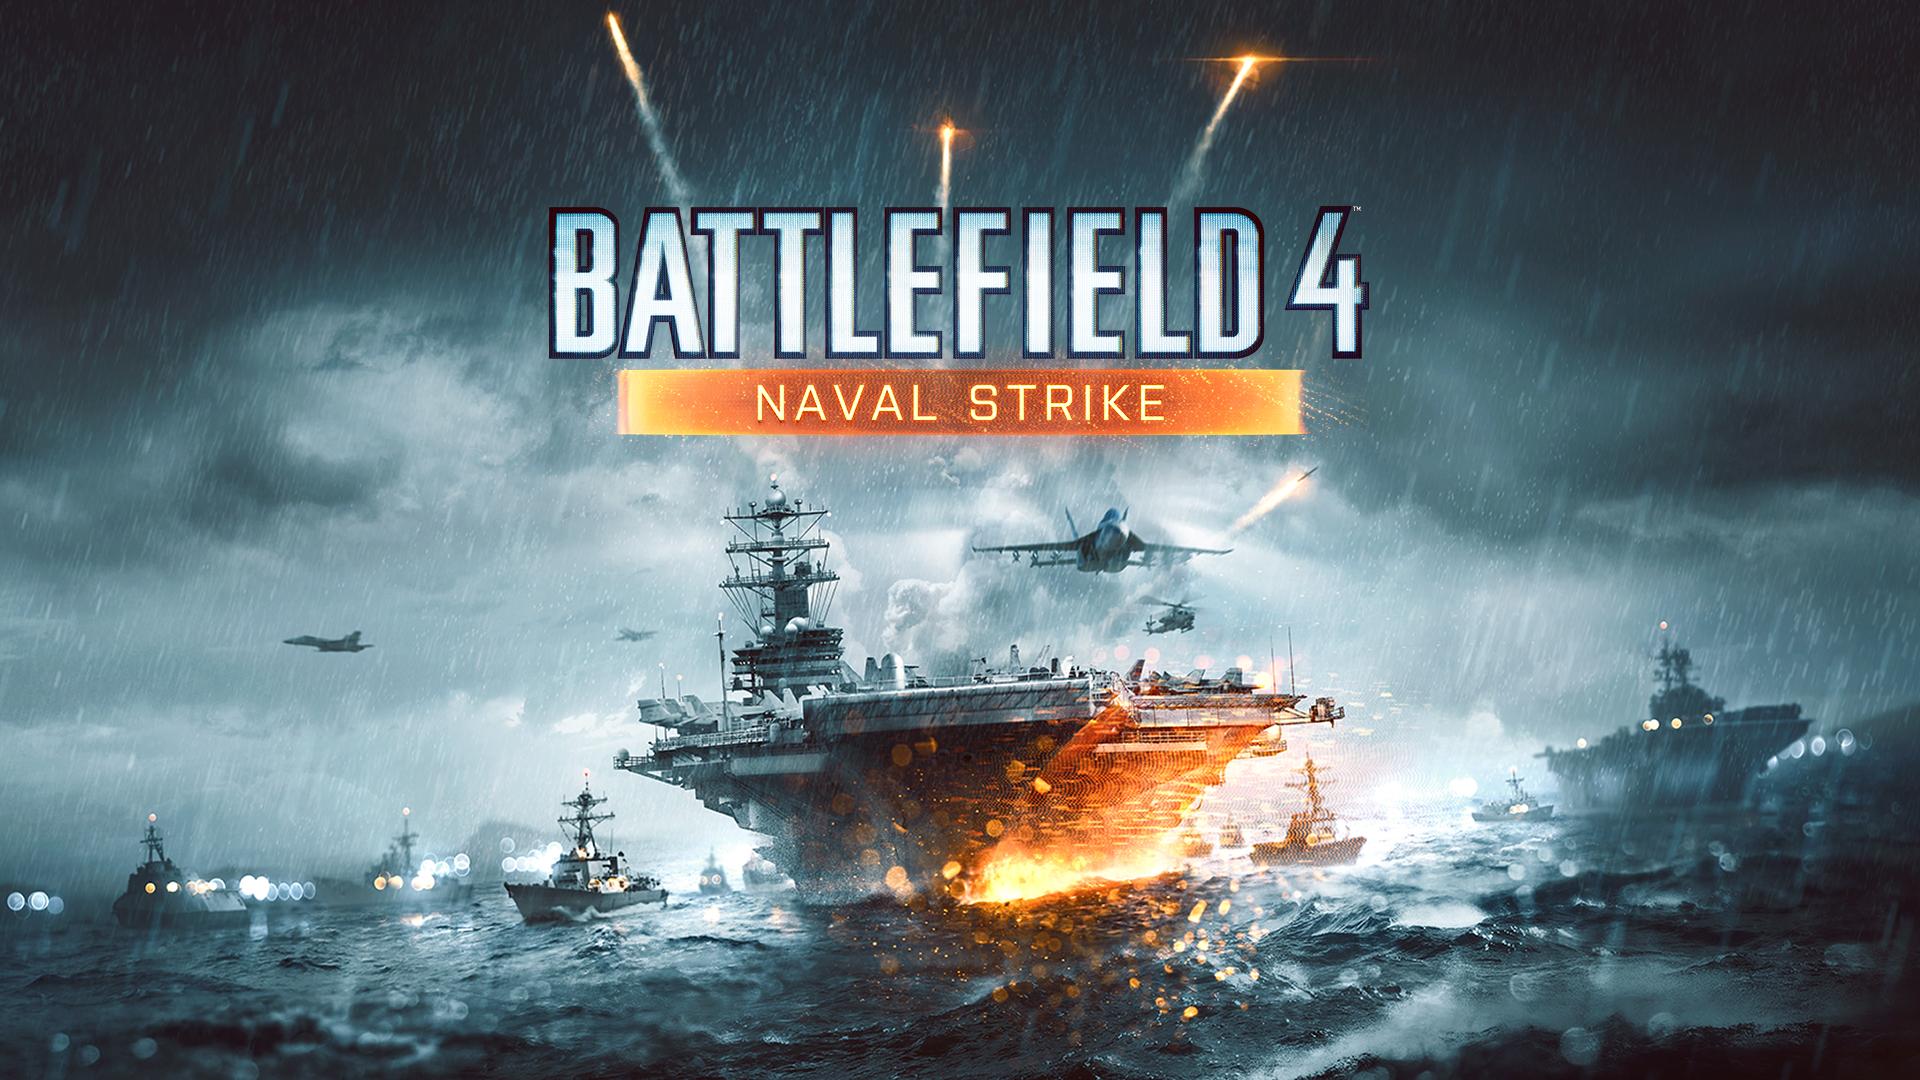 Naval Strike, descargable de Battlefield 4, llega finalmente a PC